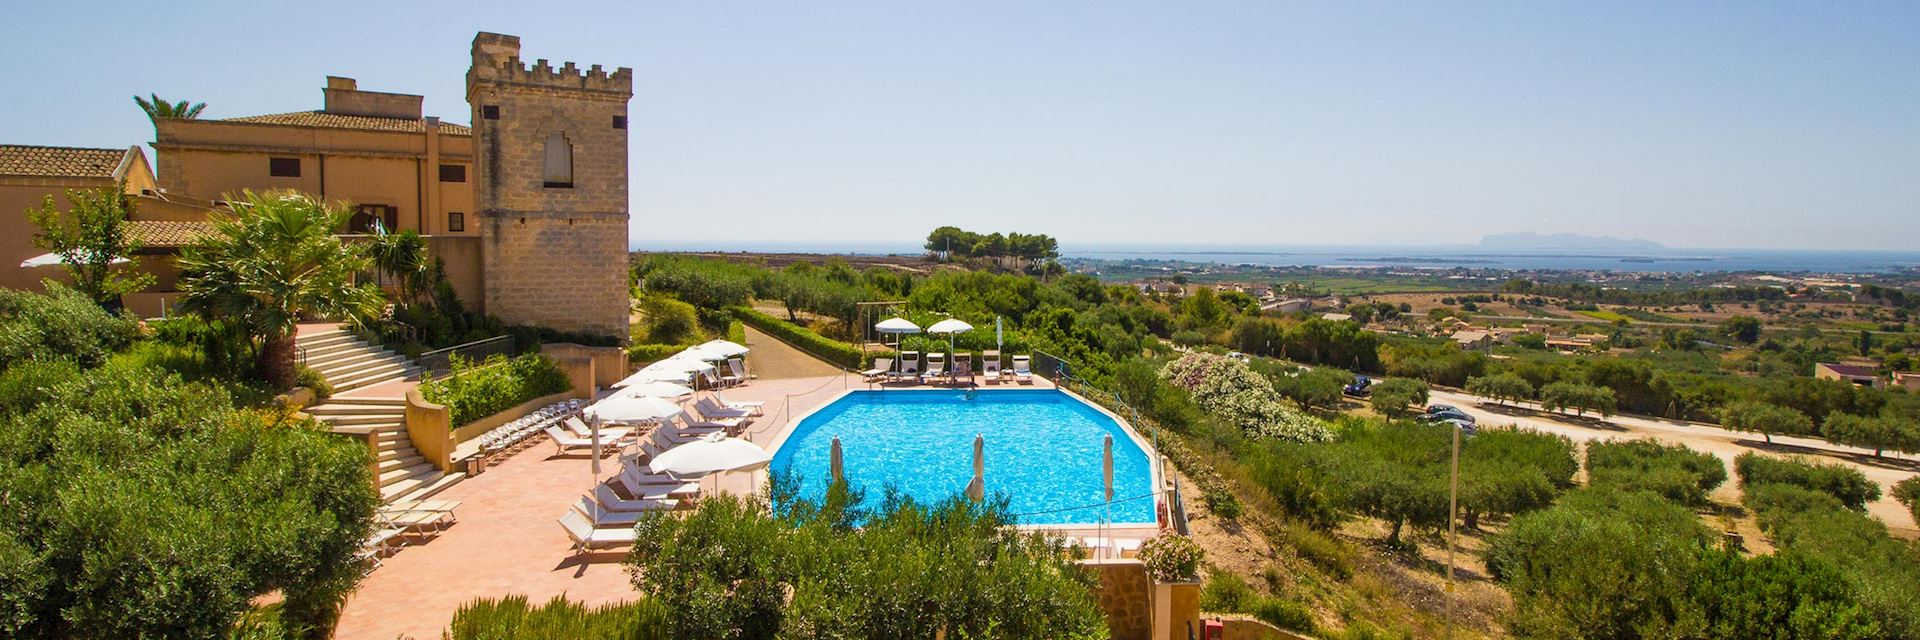 Baglio Oneto Resort, Sicily